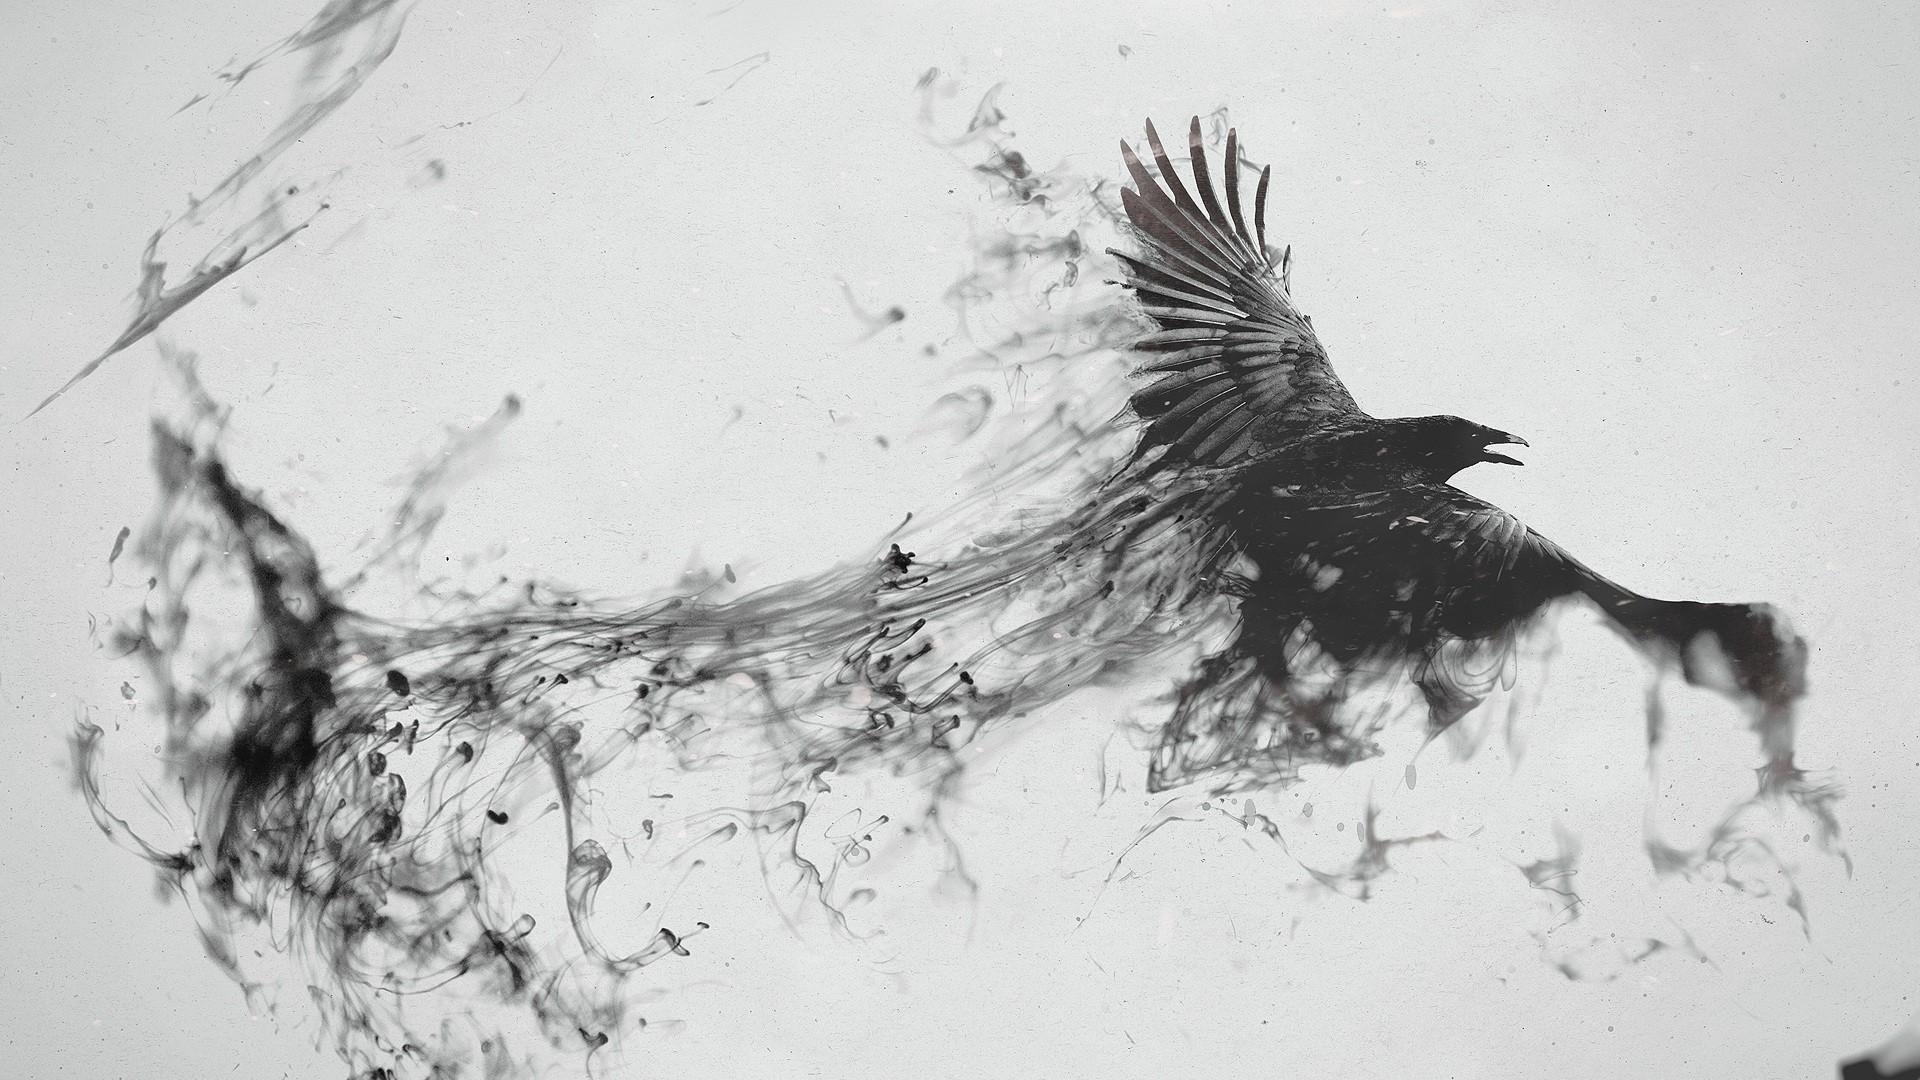 Wallpaper raven, bird, flying, smoke, black white